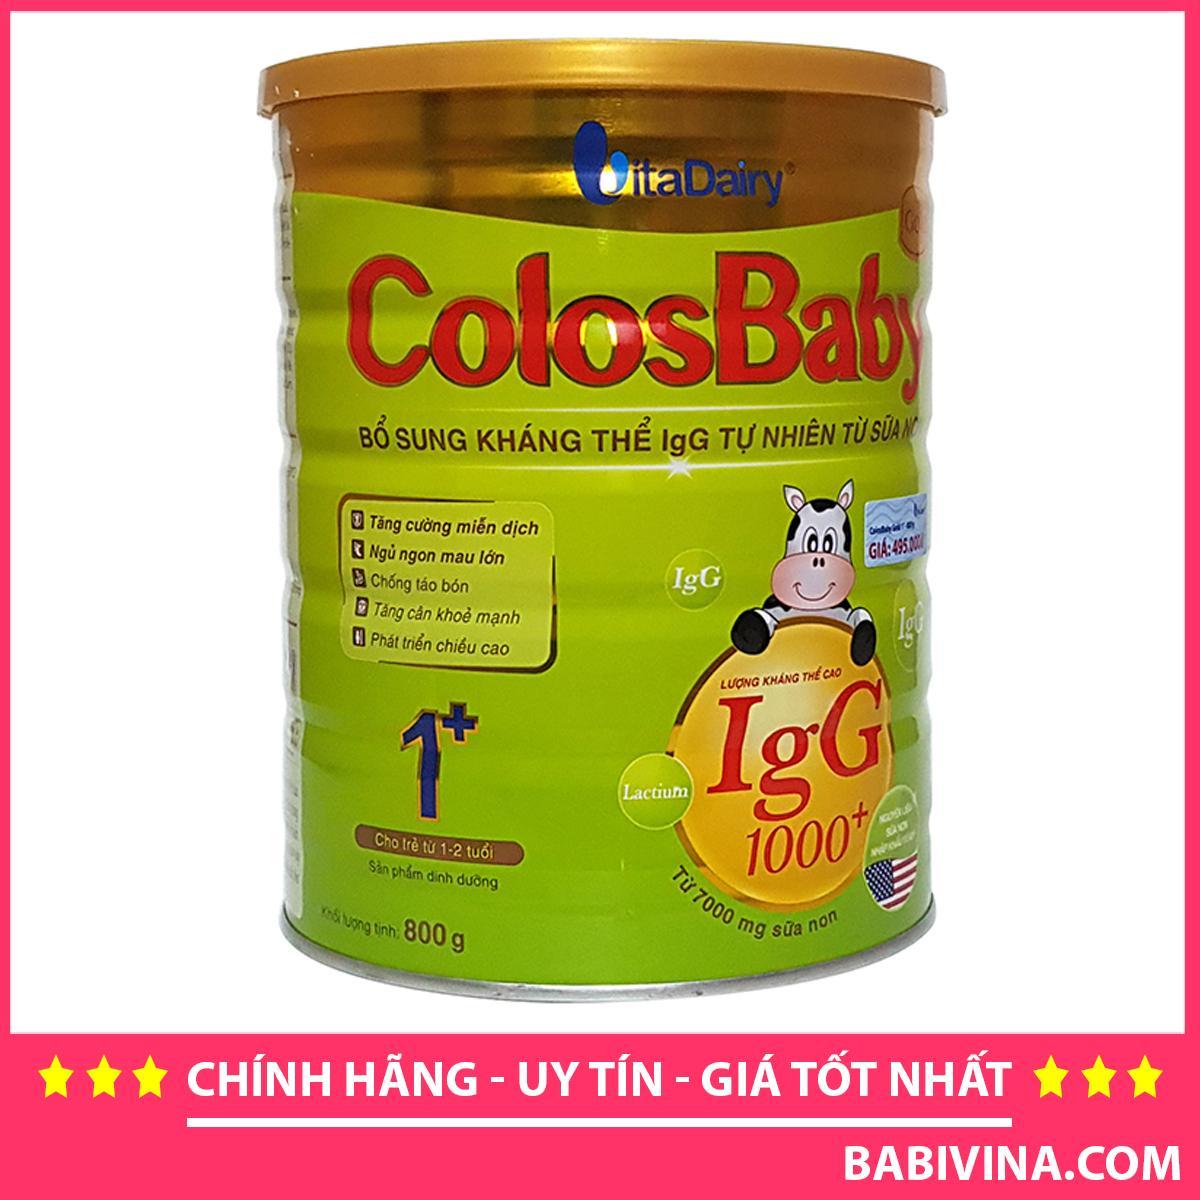 Sữa Non ColosBaby Gold Số 1 800g 1000IgG Cho Trẻ...